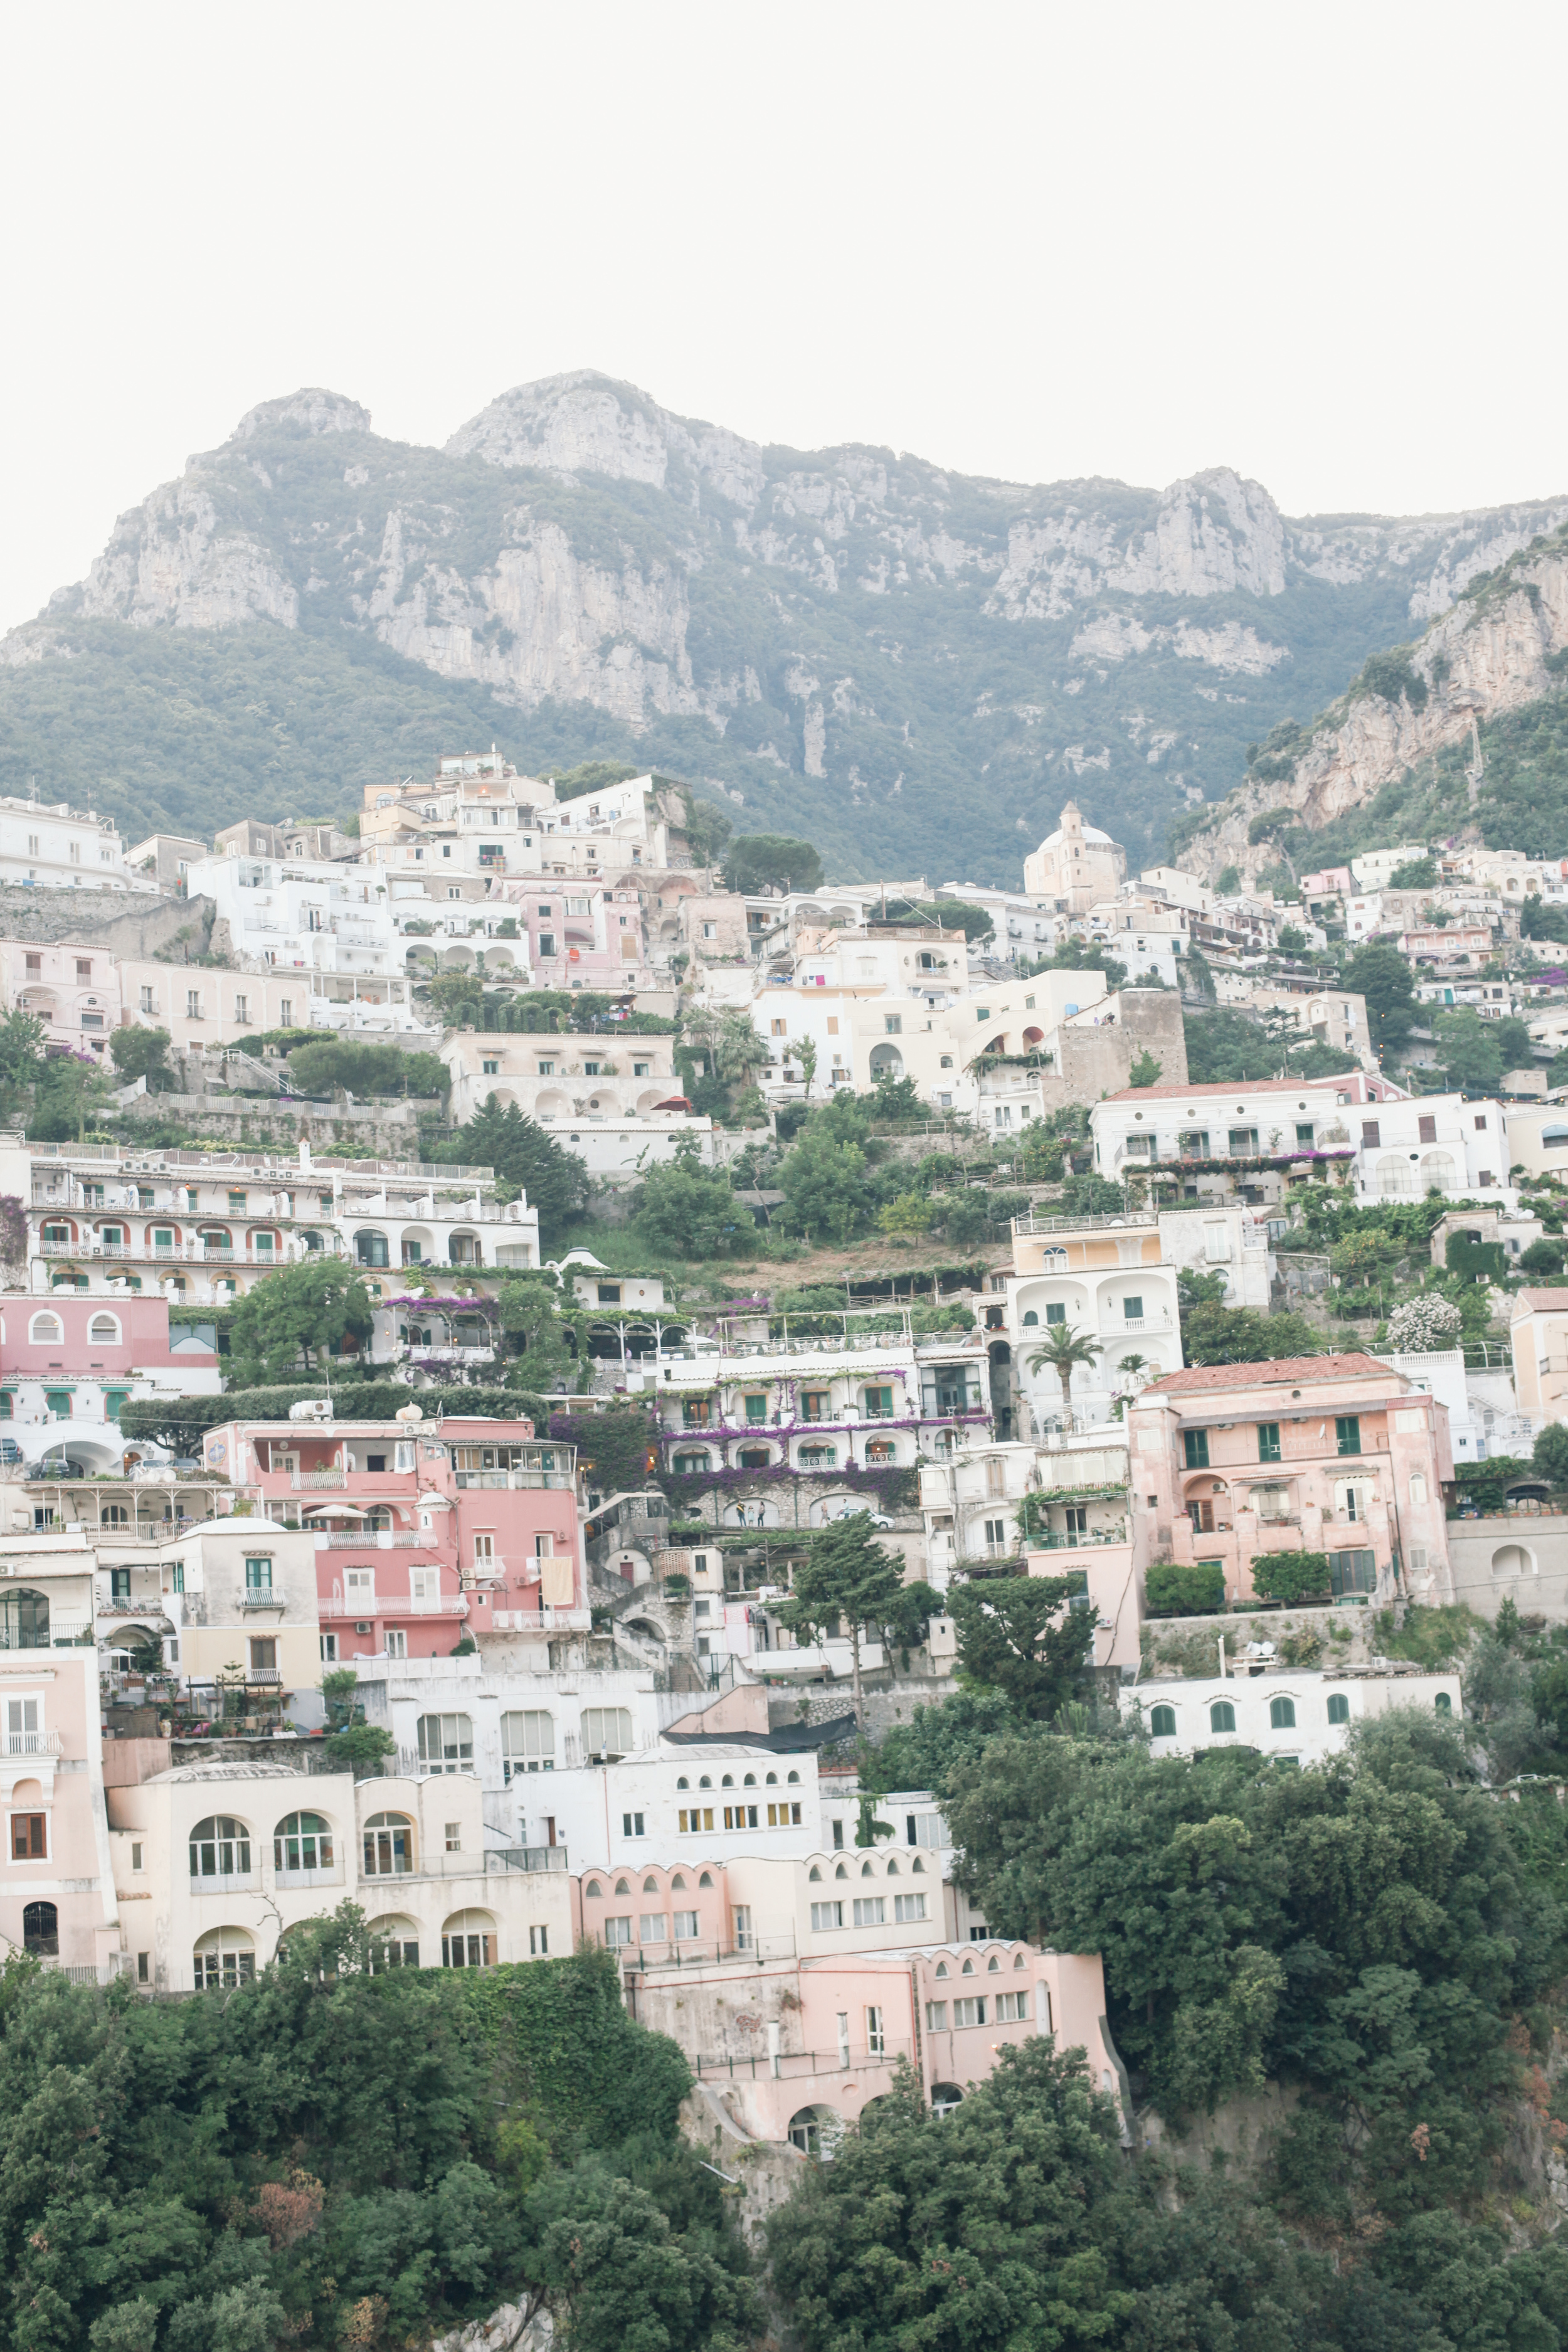 Italy2013-44.jpg